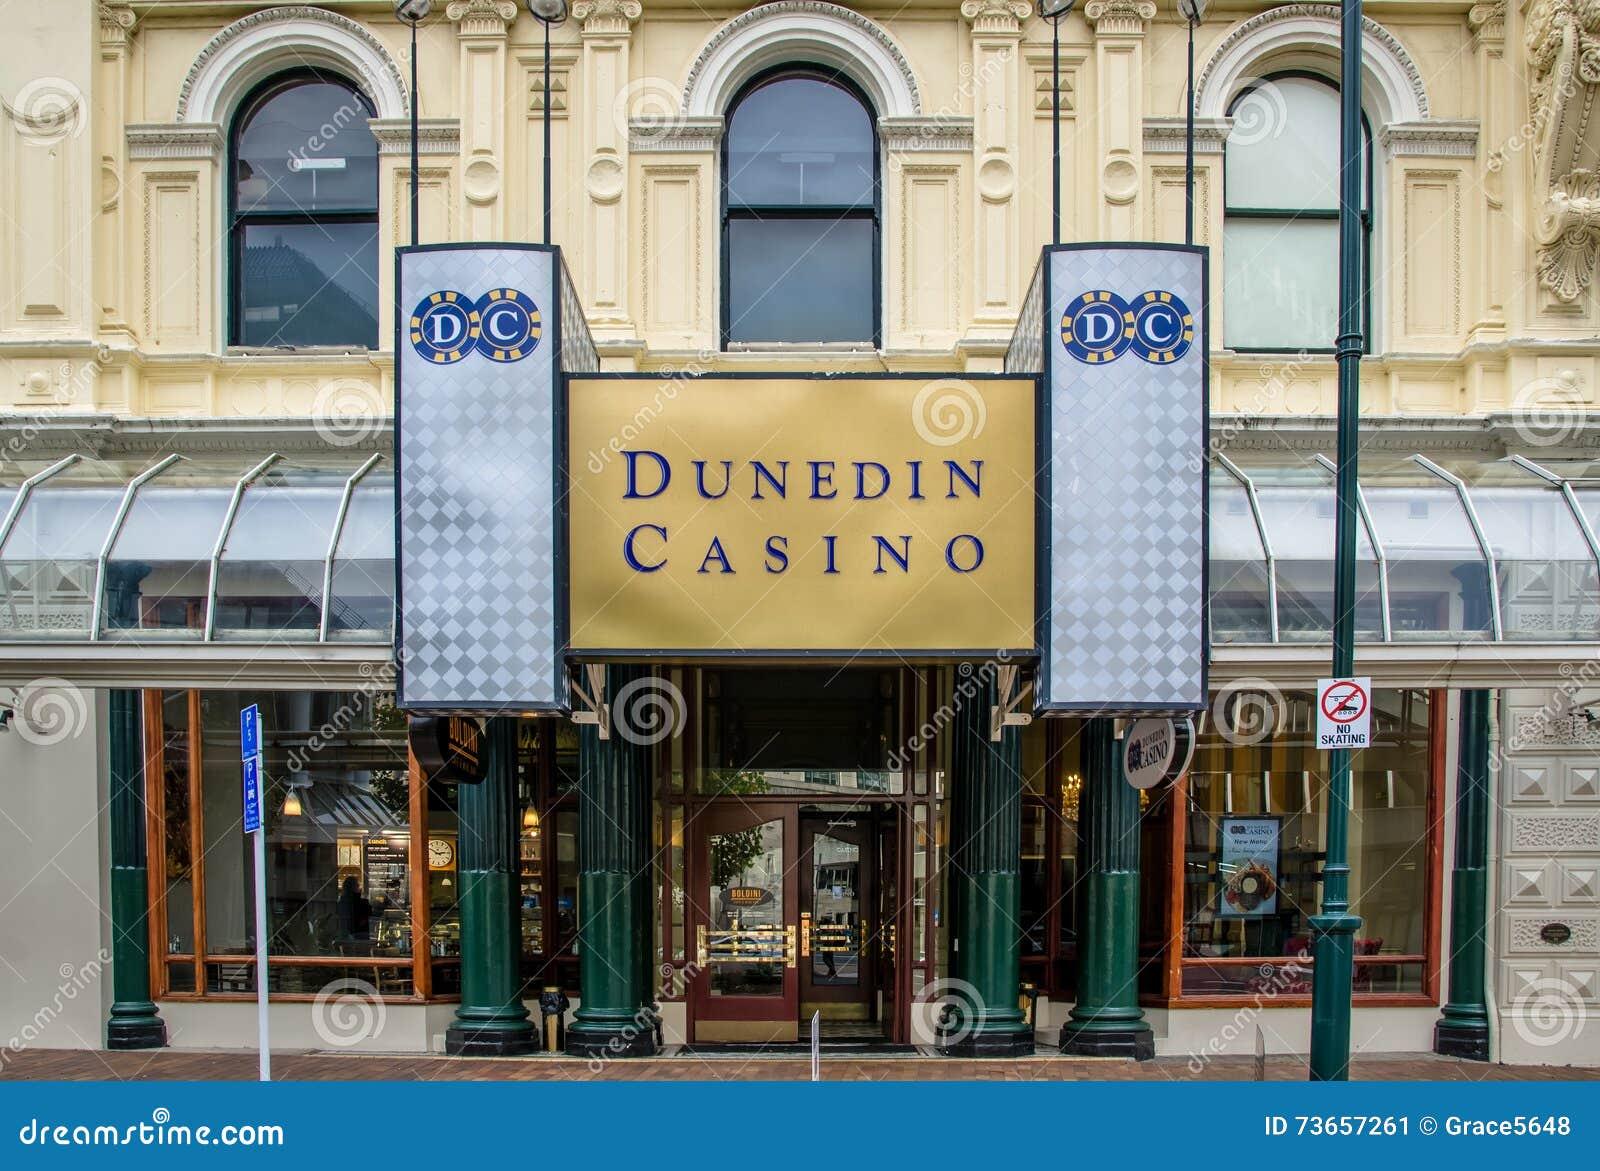 Casino dunedin nz hourseshoe casino of bossier city